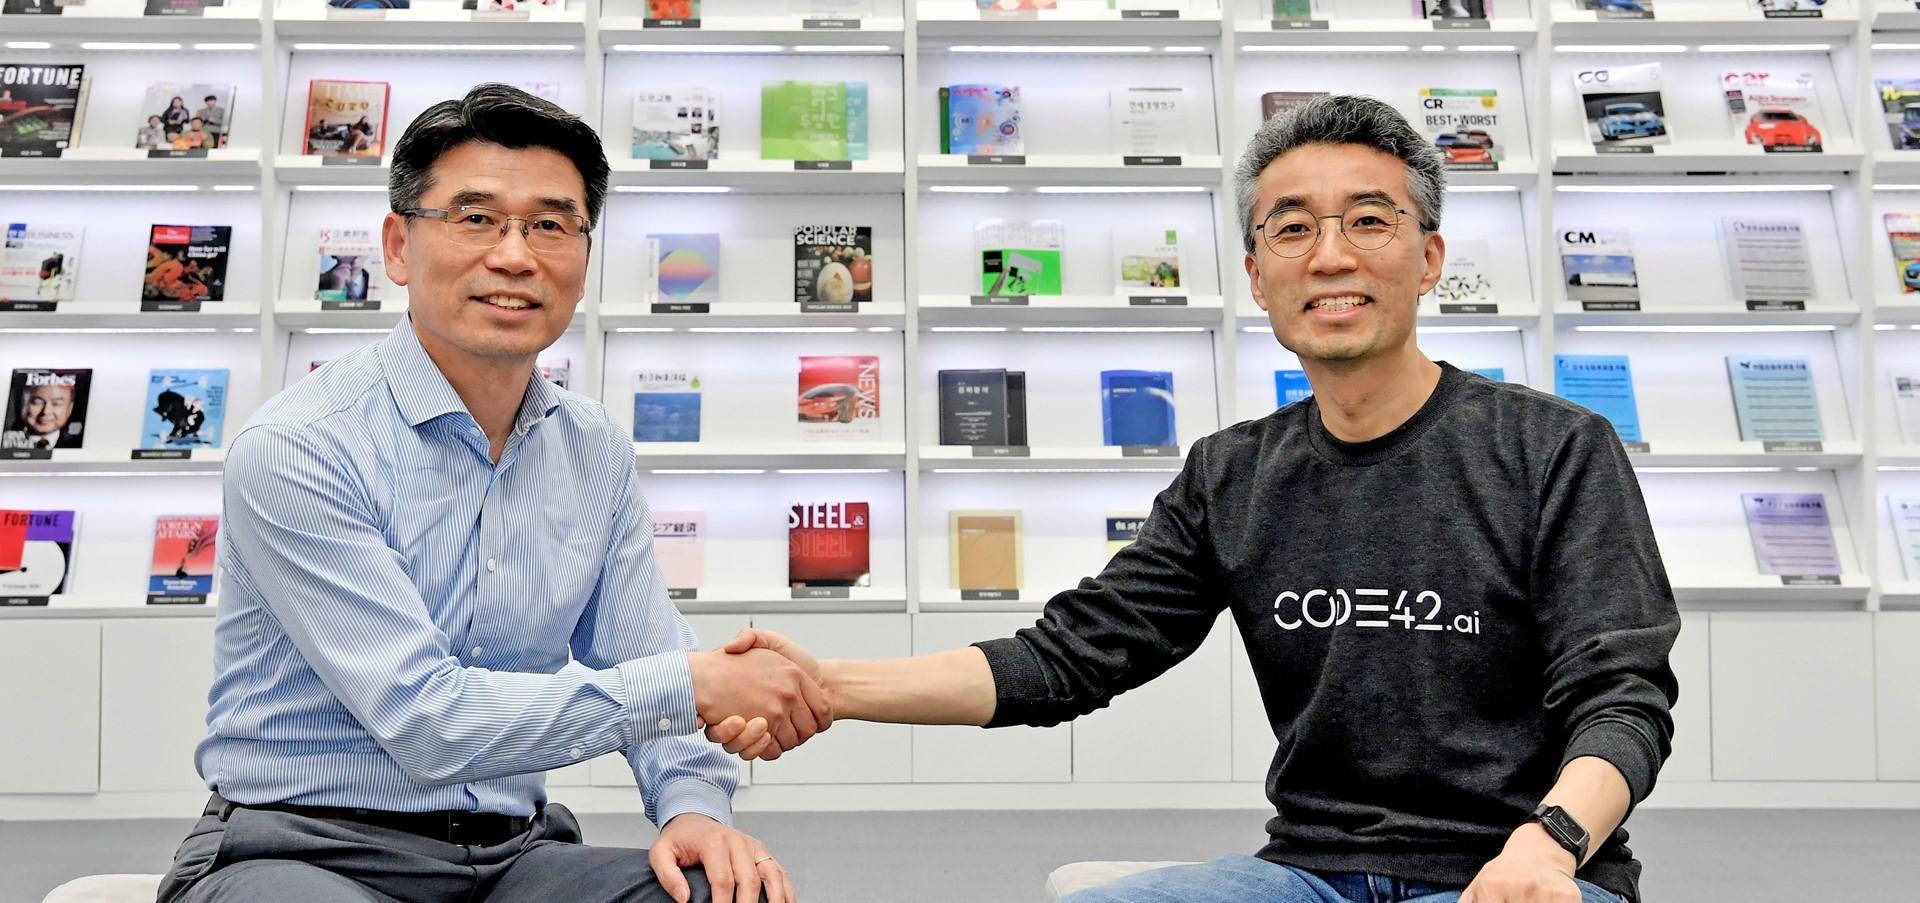 Kia establishes 'Purple M' start-up